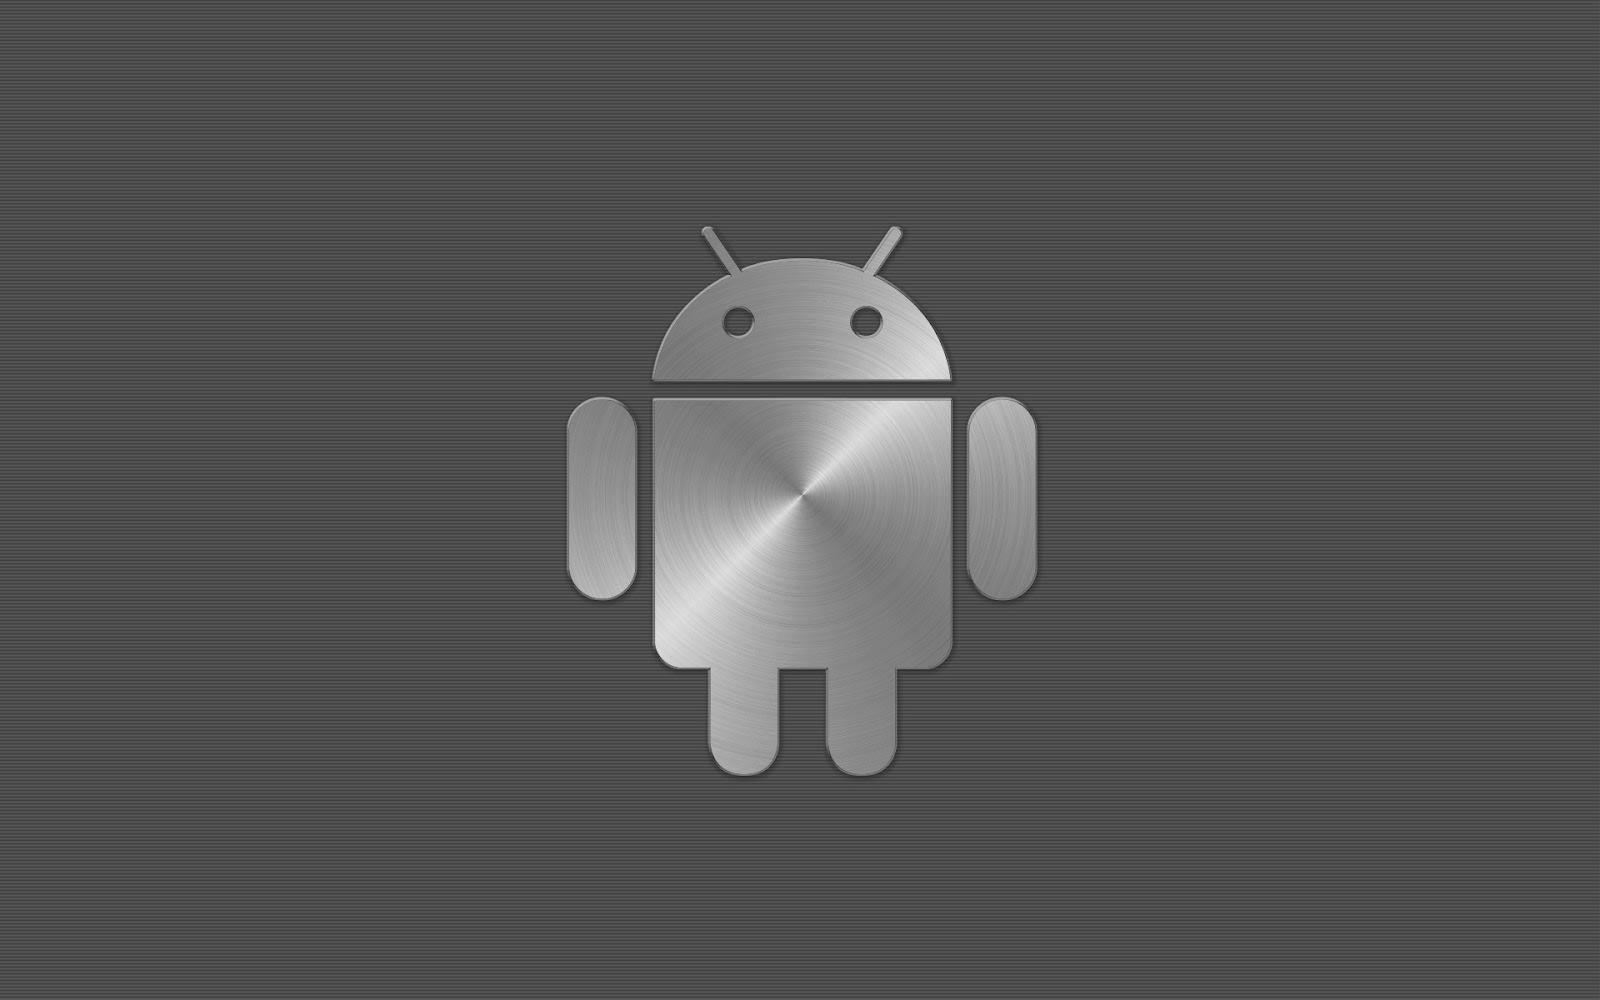 http://3.bp.blogspot.com/-1z7YVABpwG4/T-yEawxUMeI/AAAAAAAAAhA/GU0nPpspiwo/s1600/android+HD+Wallpaper+hd+(2).jpg